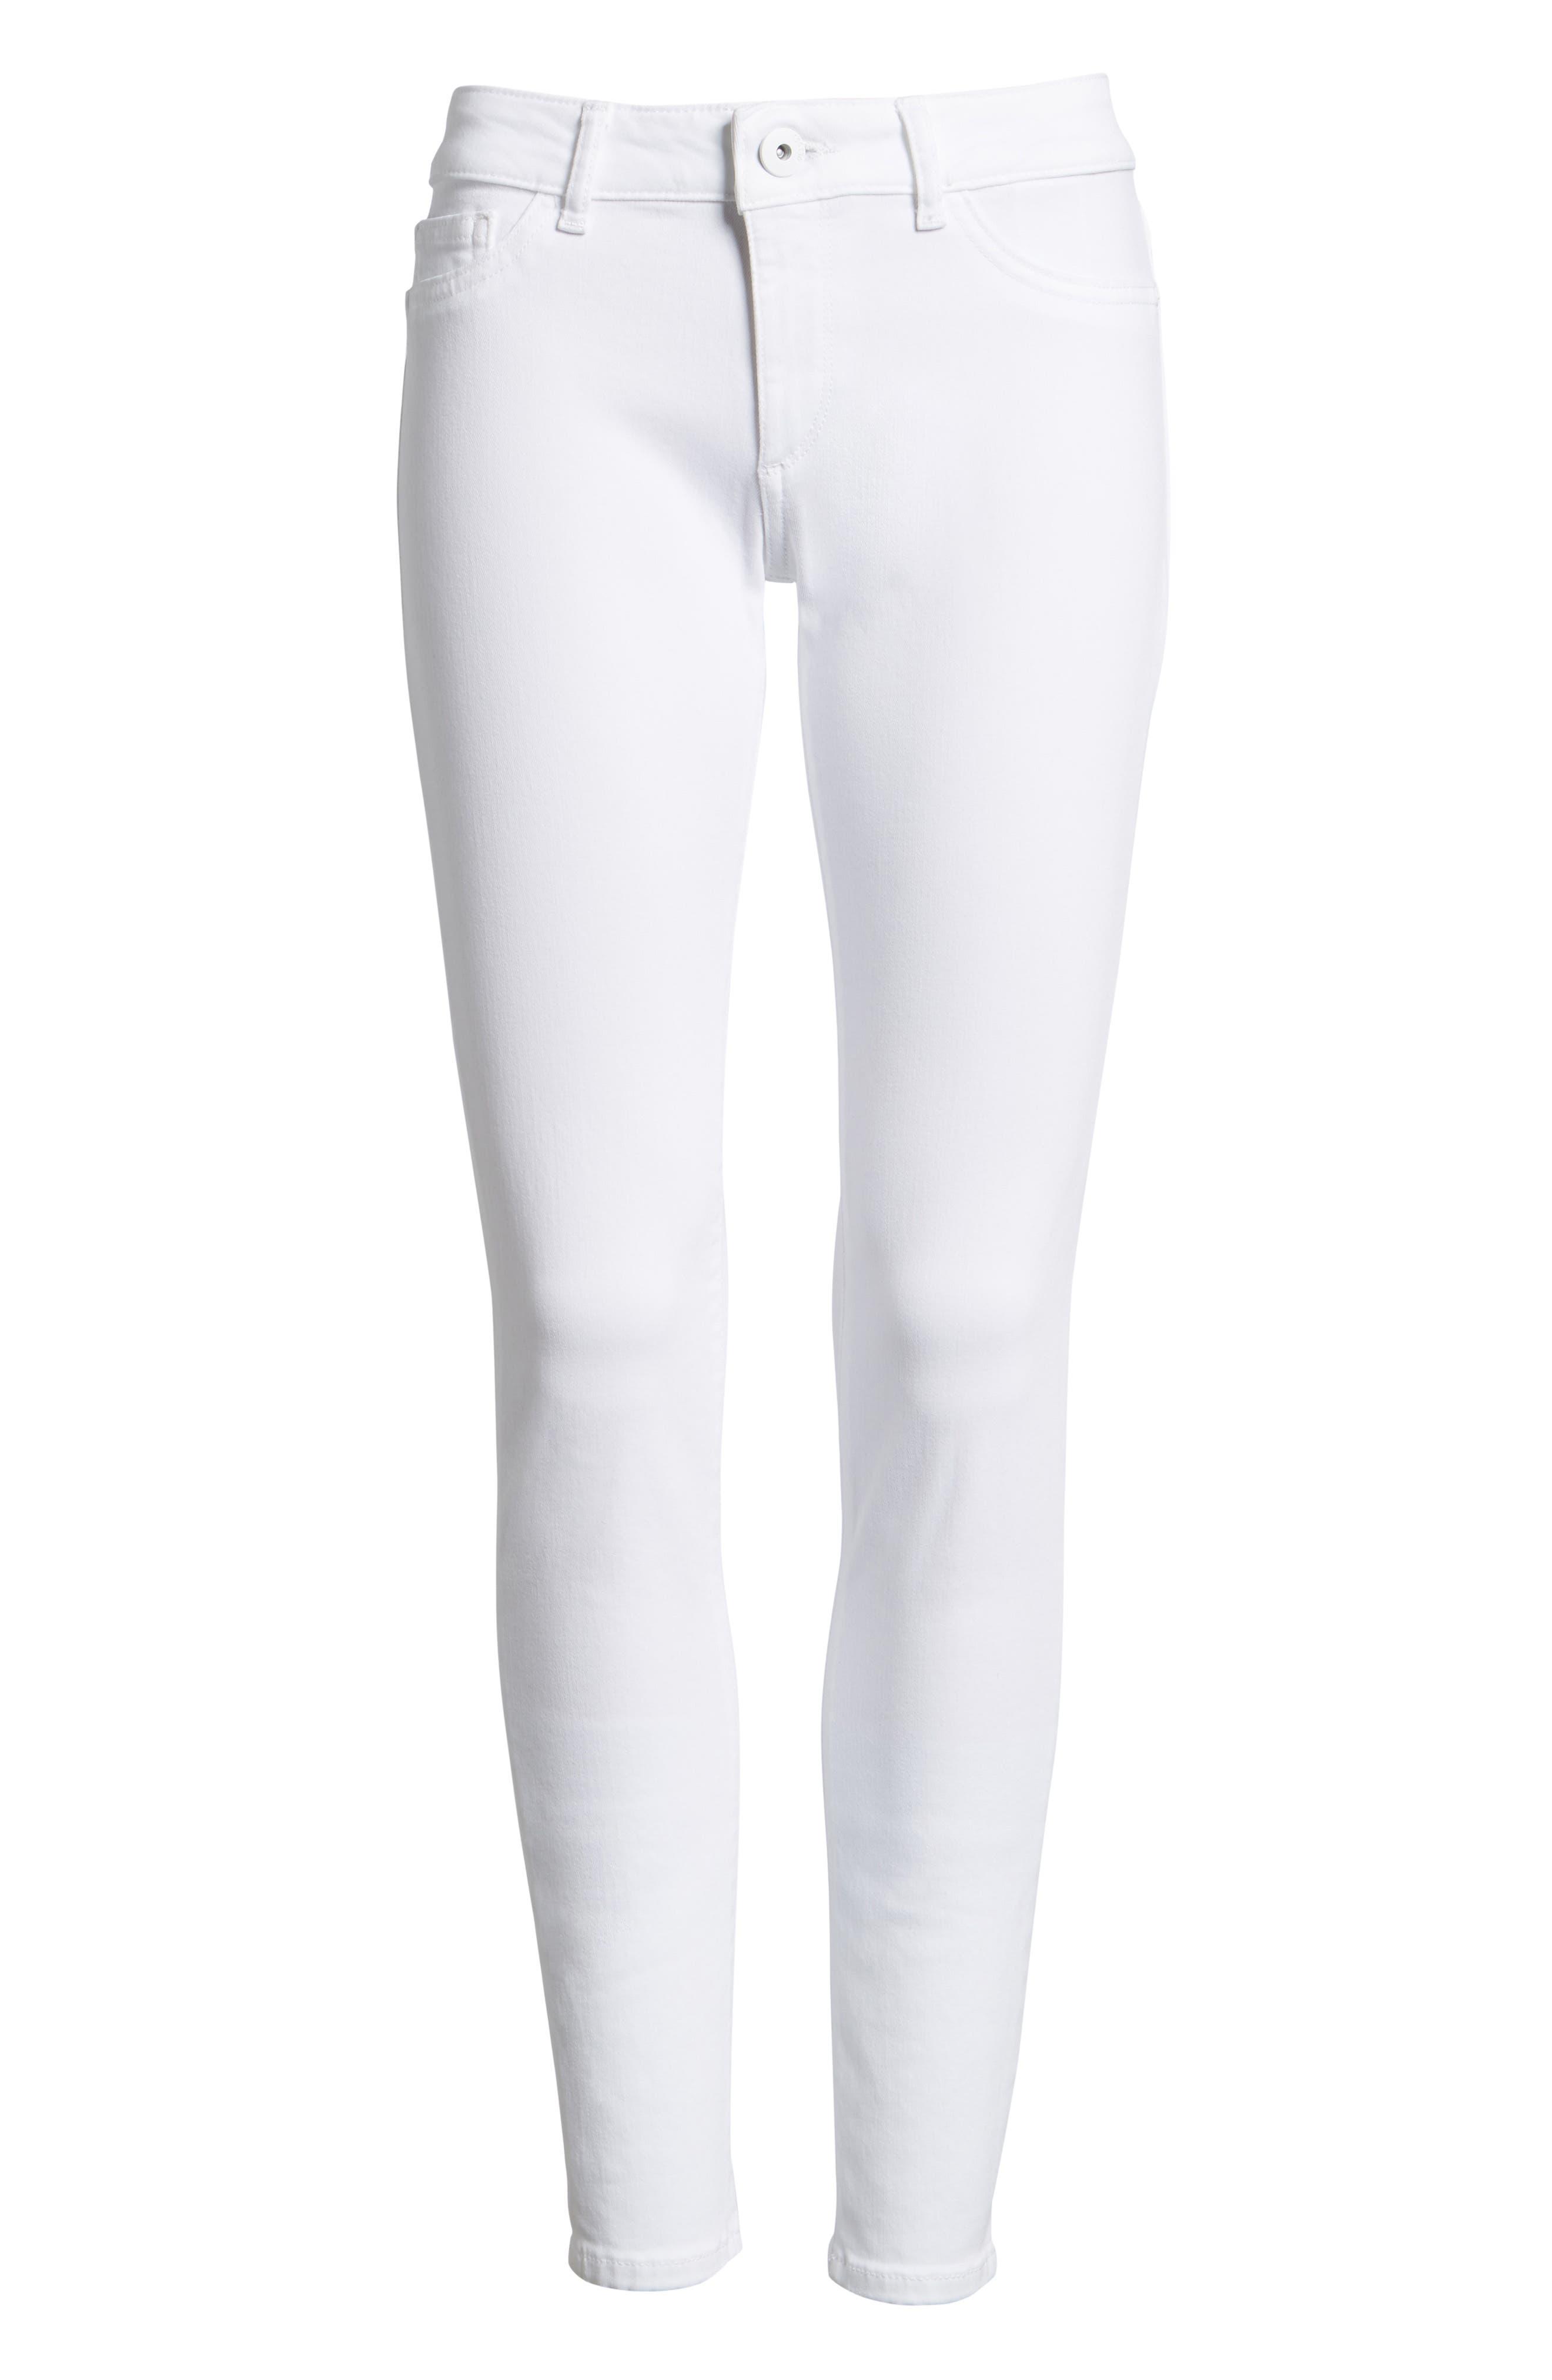 'Emma' Power Legging Jeans,                         Main,                         color, 100